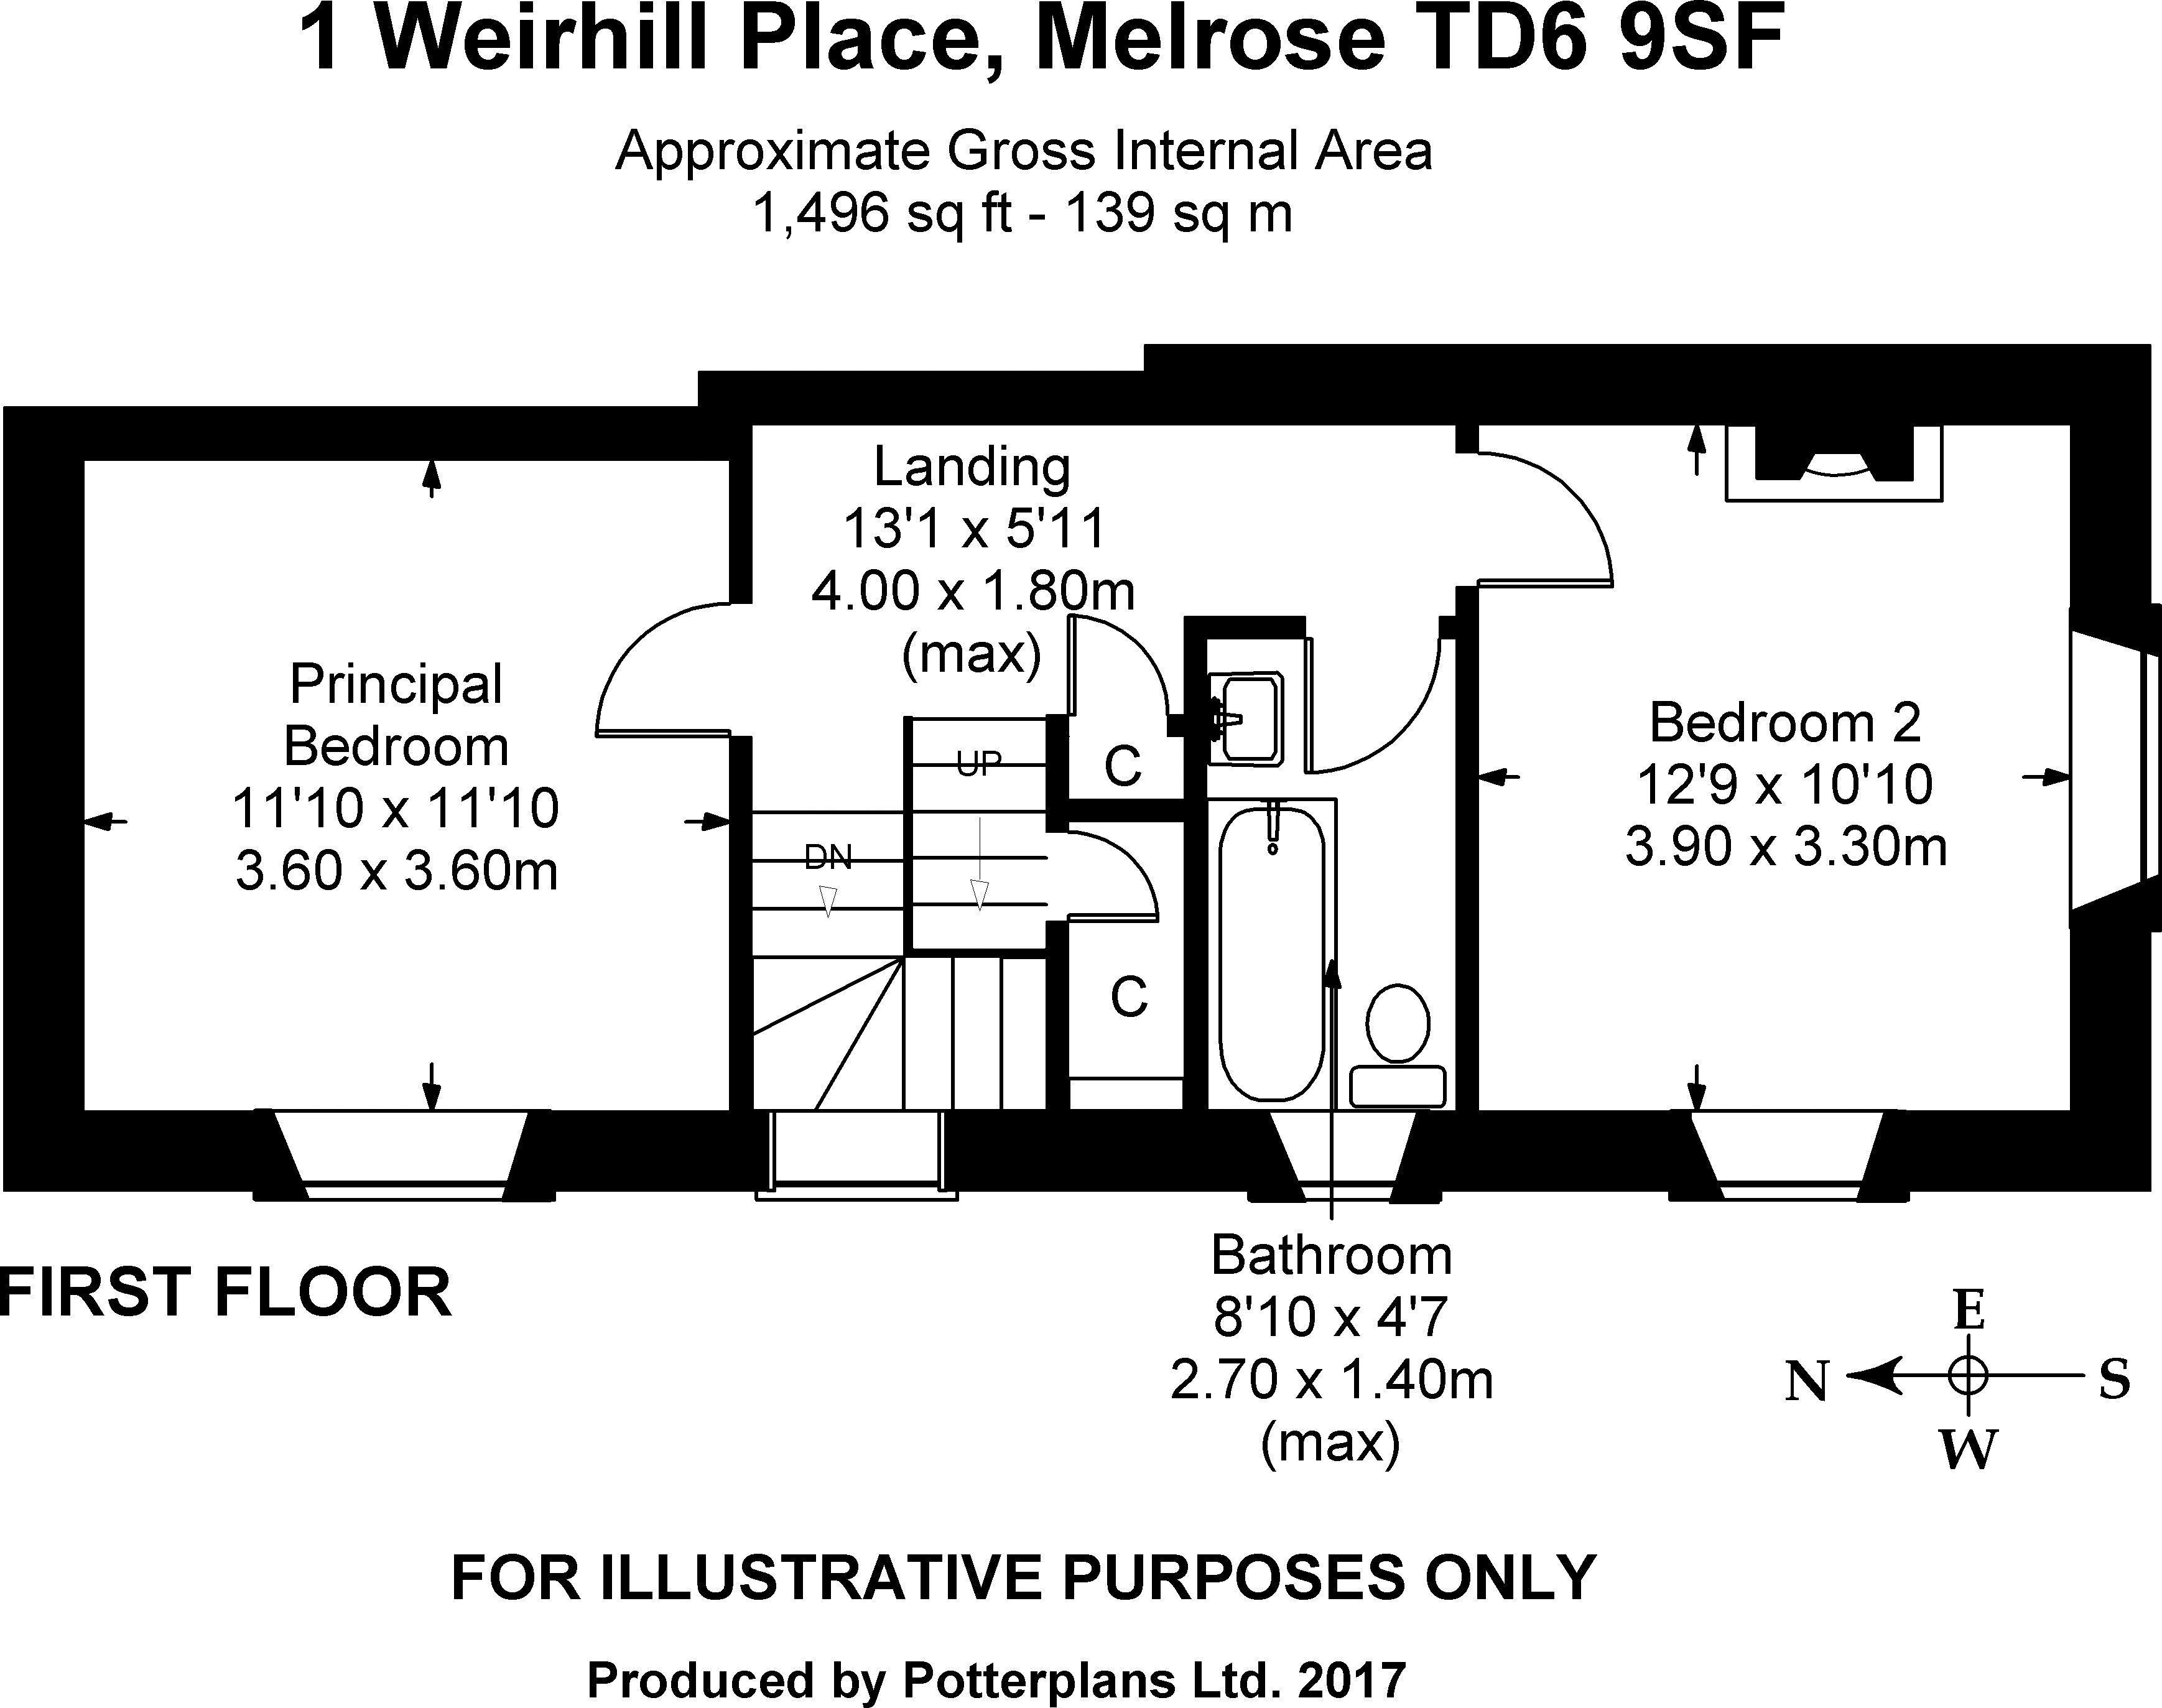 1 Weirhill Place First Floor